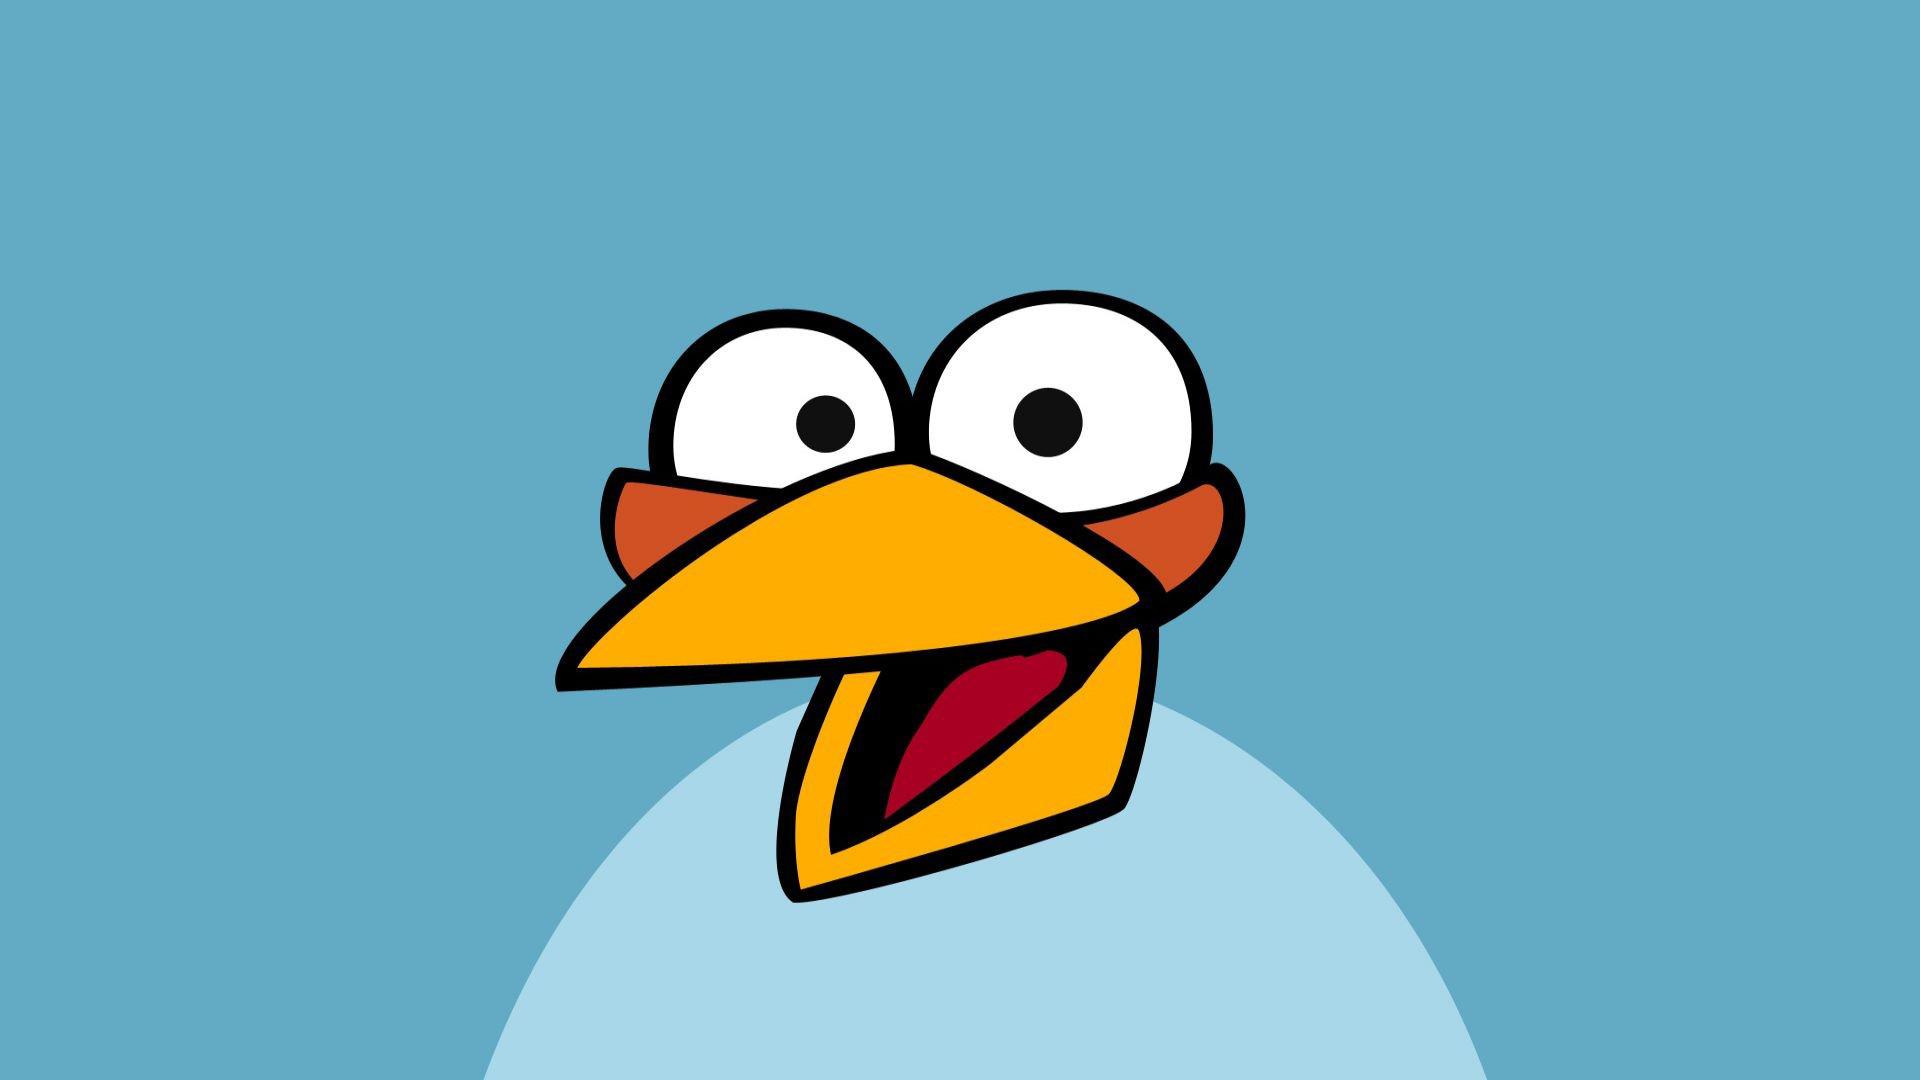 Blue Angry Bird Wallpaper